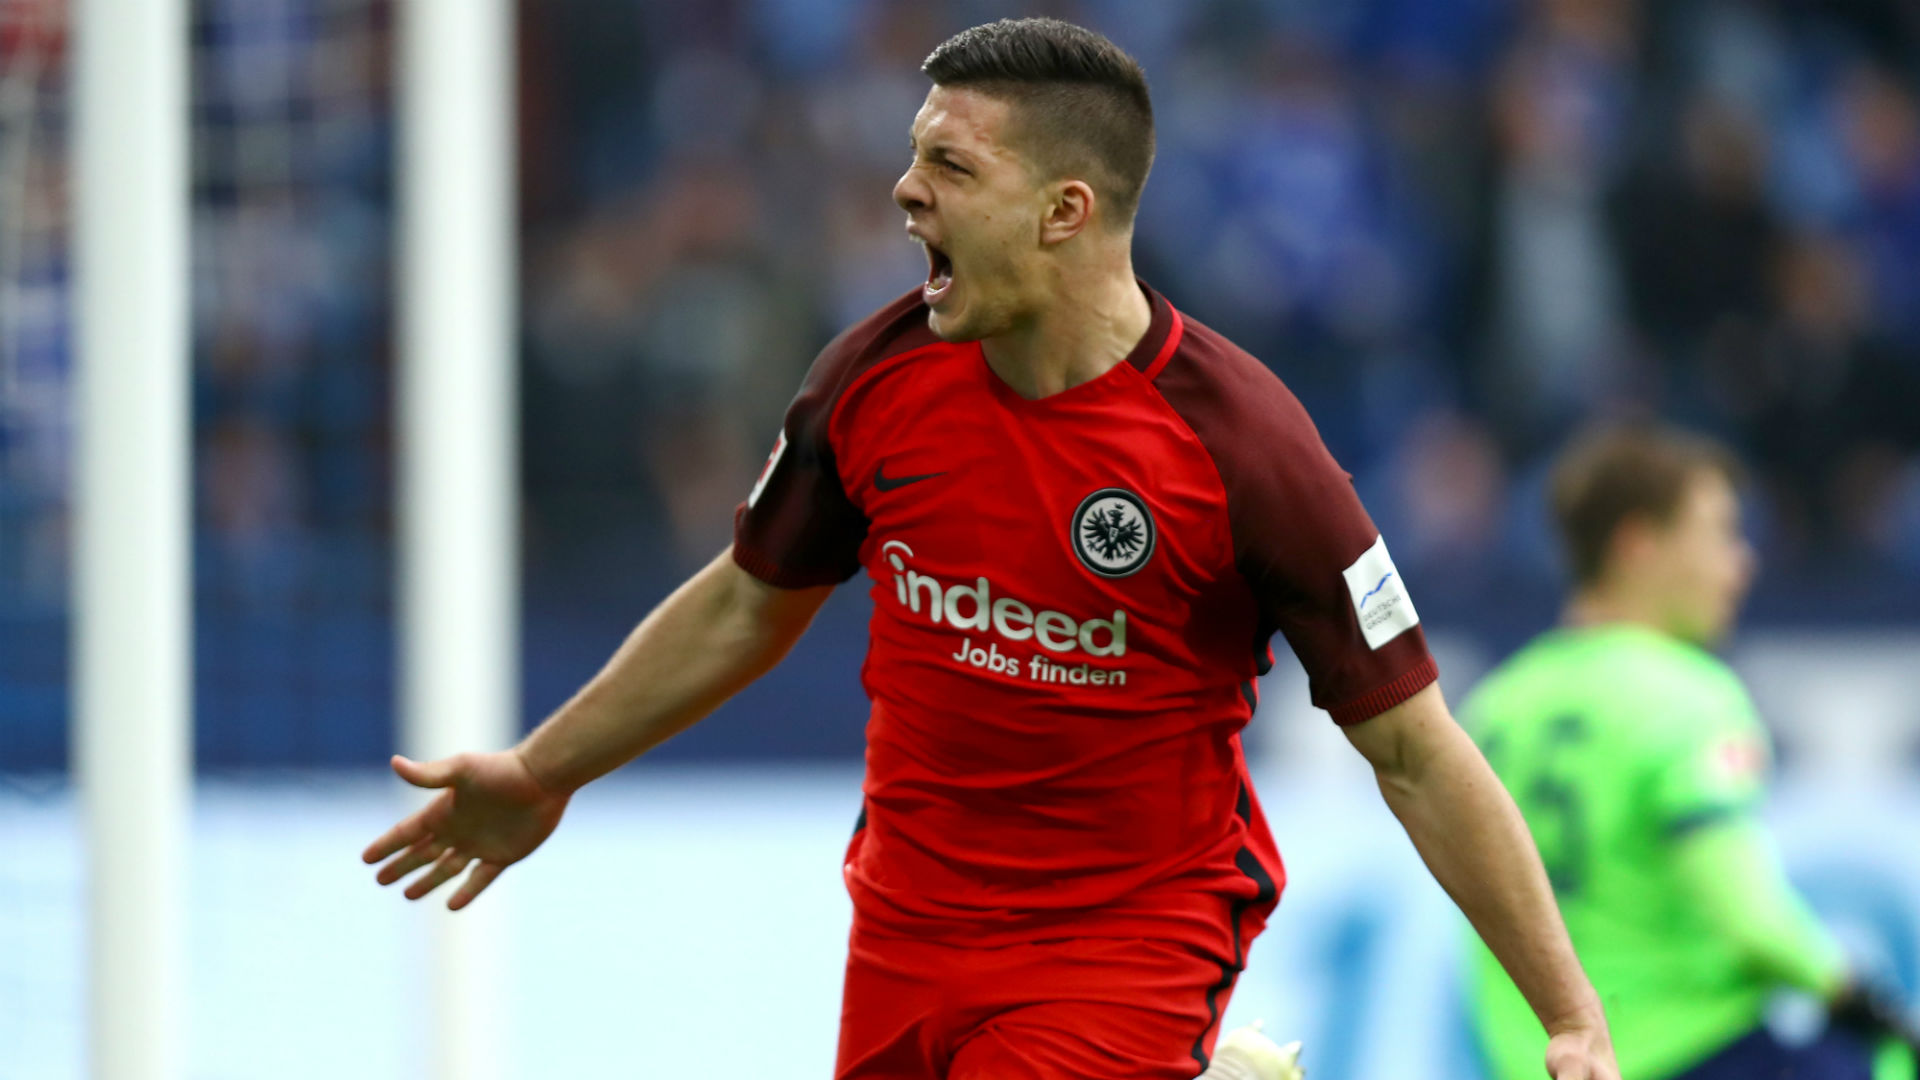 Eintracht Frankfurt trigger purchase option on Barcelona-linked Jovic